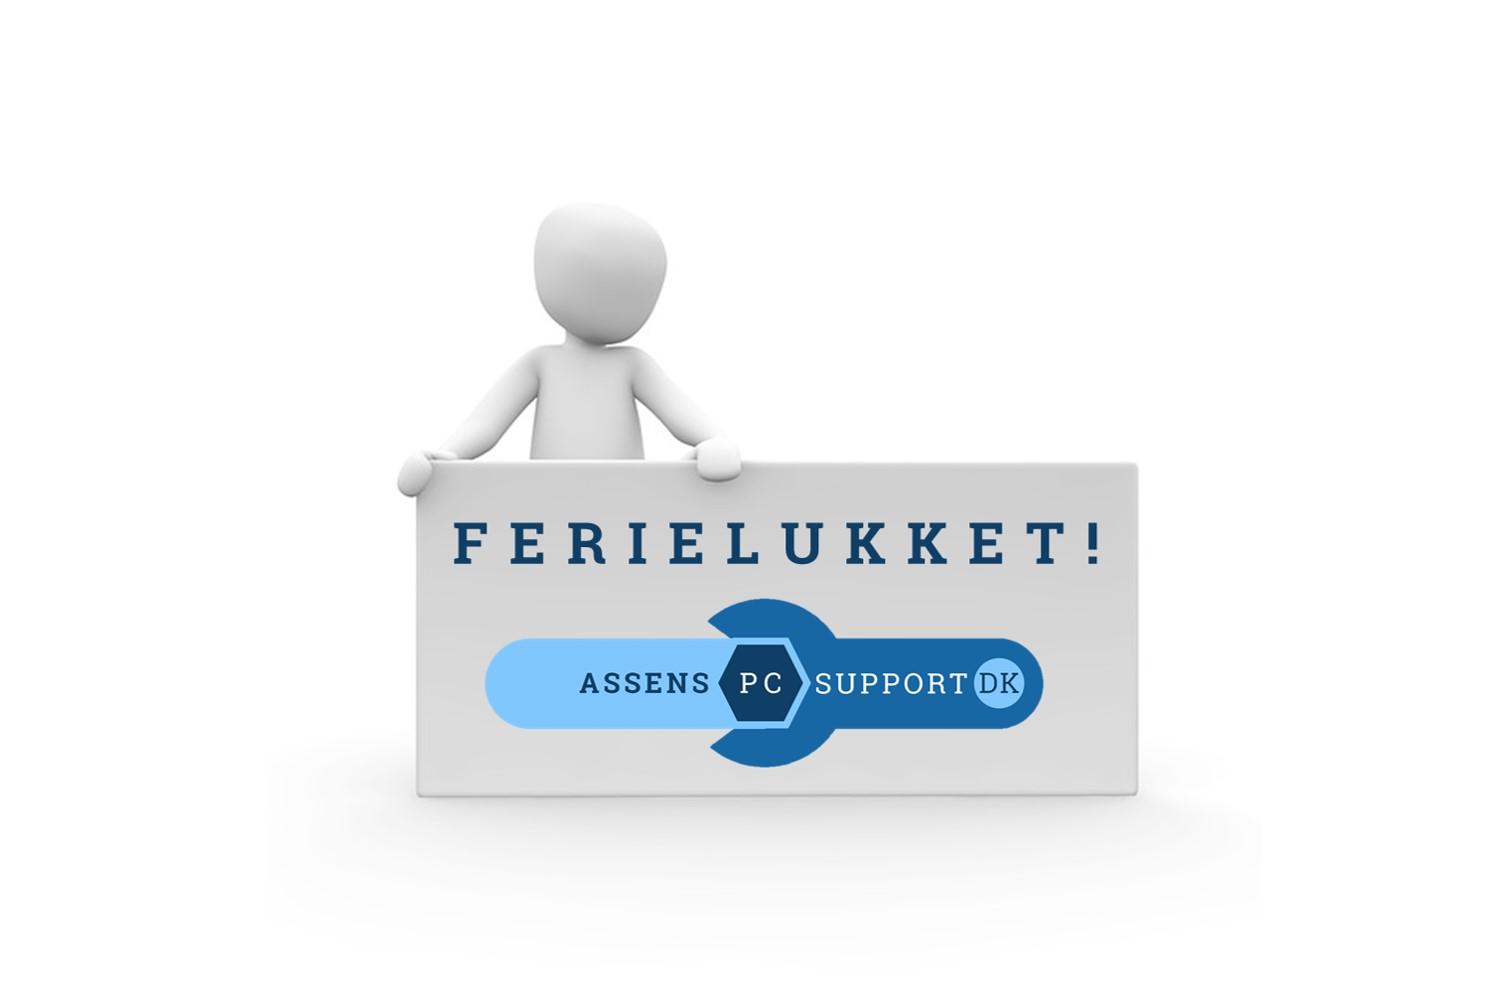 AssensPCsupport.dk - Ferielukket